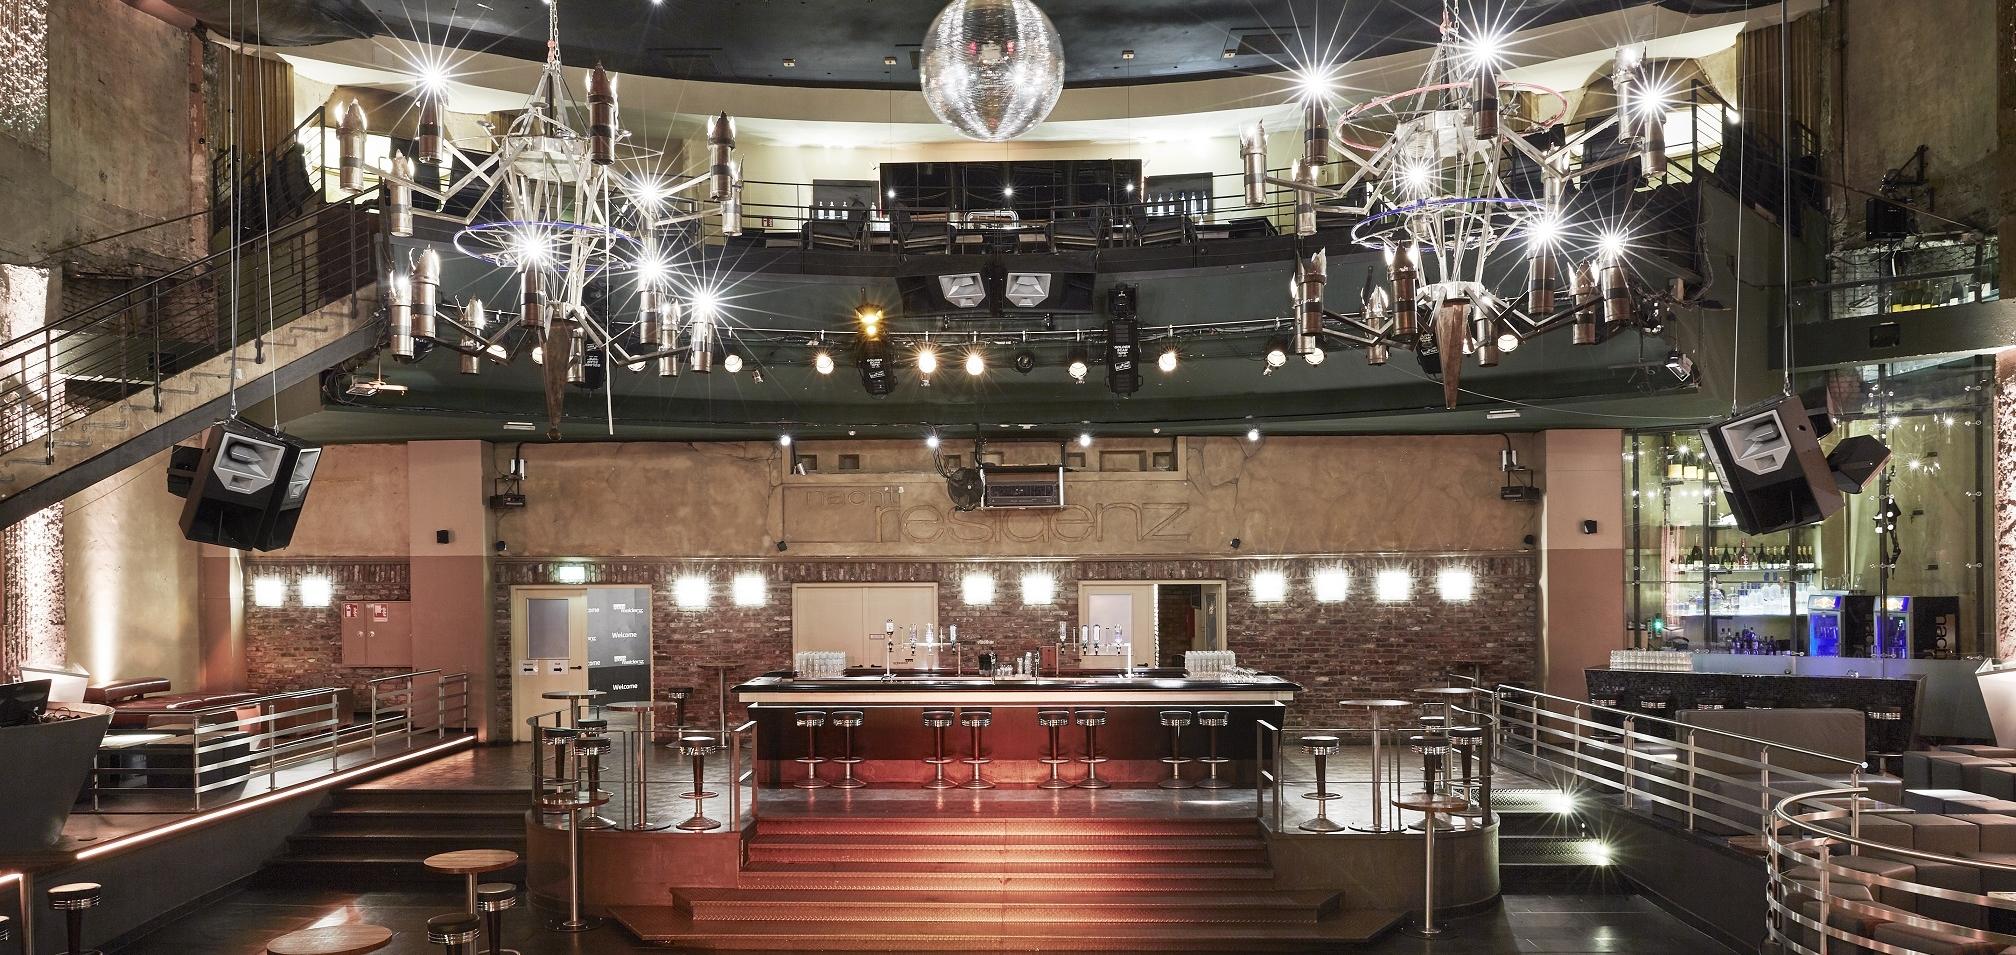 Nachtresidenz Kuppelsaal